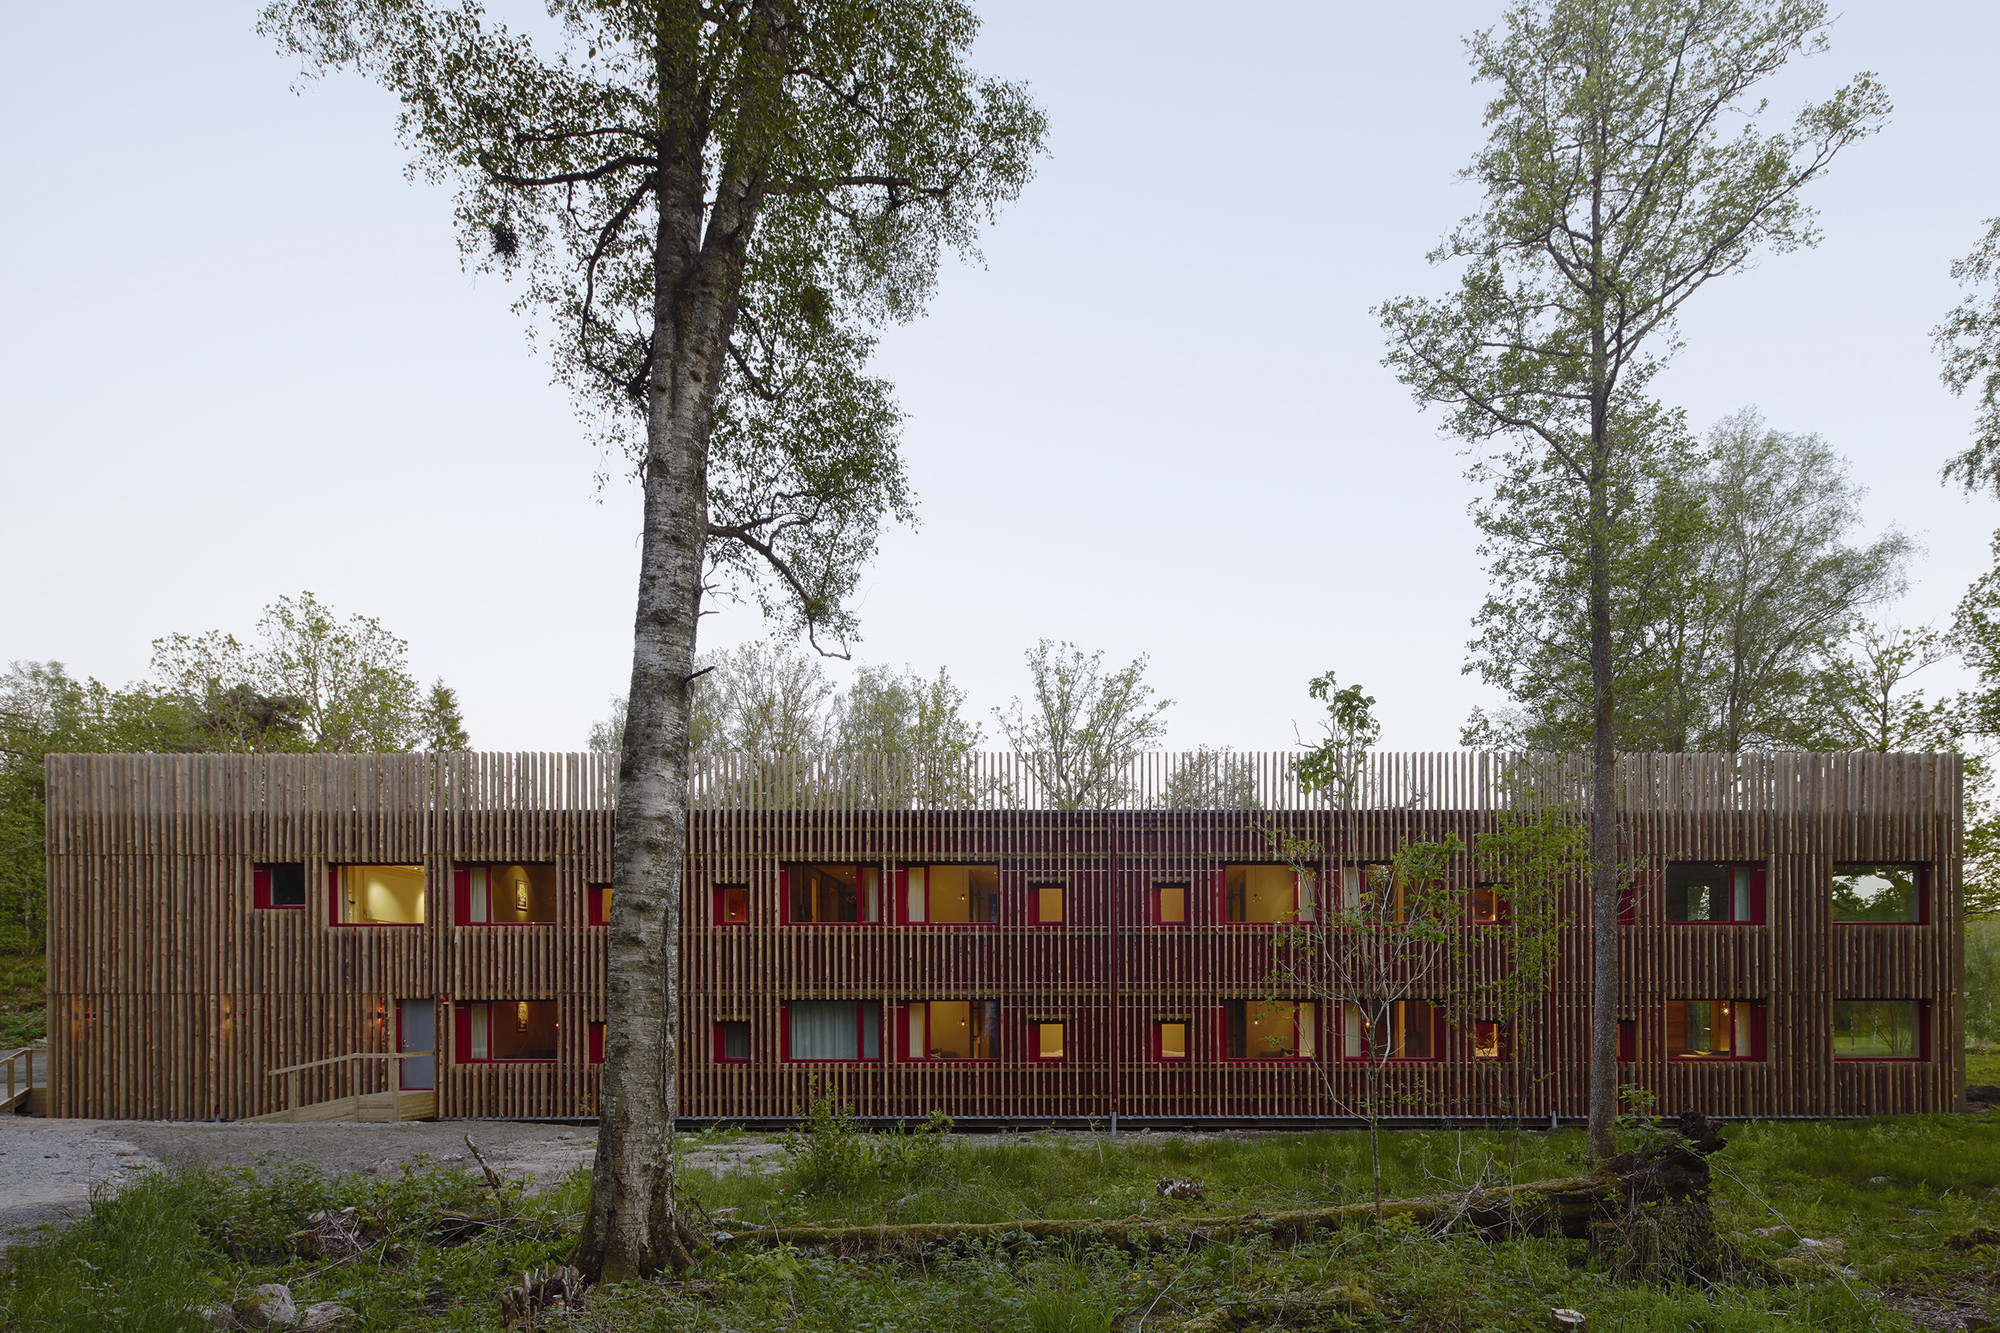 Öijared  Hotel  / Kjellgren Kaminsky Architecture, © Åke E:son Lindman